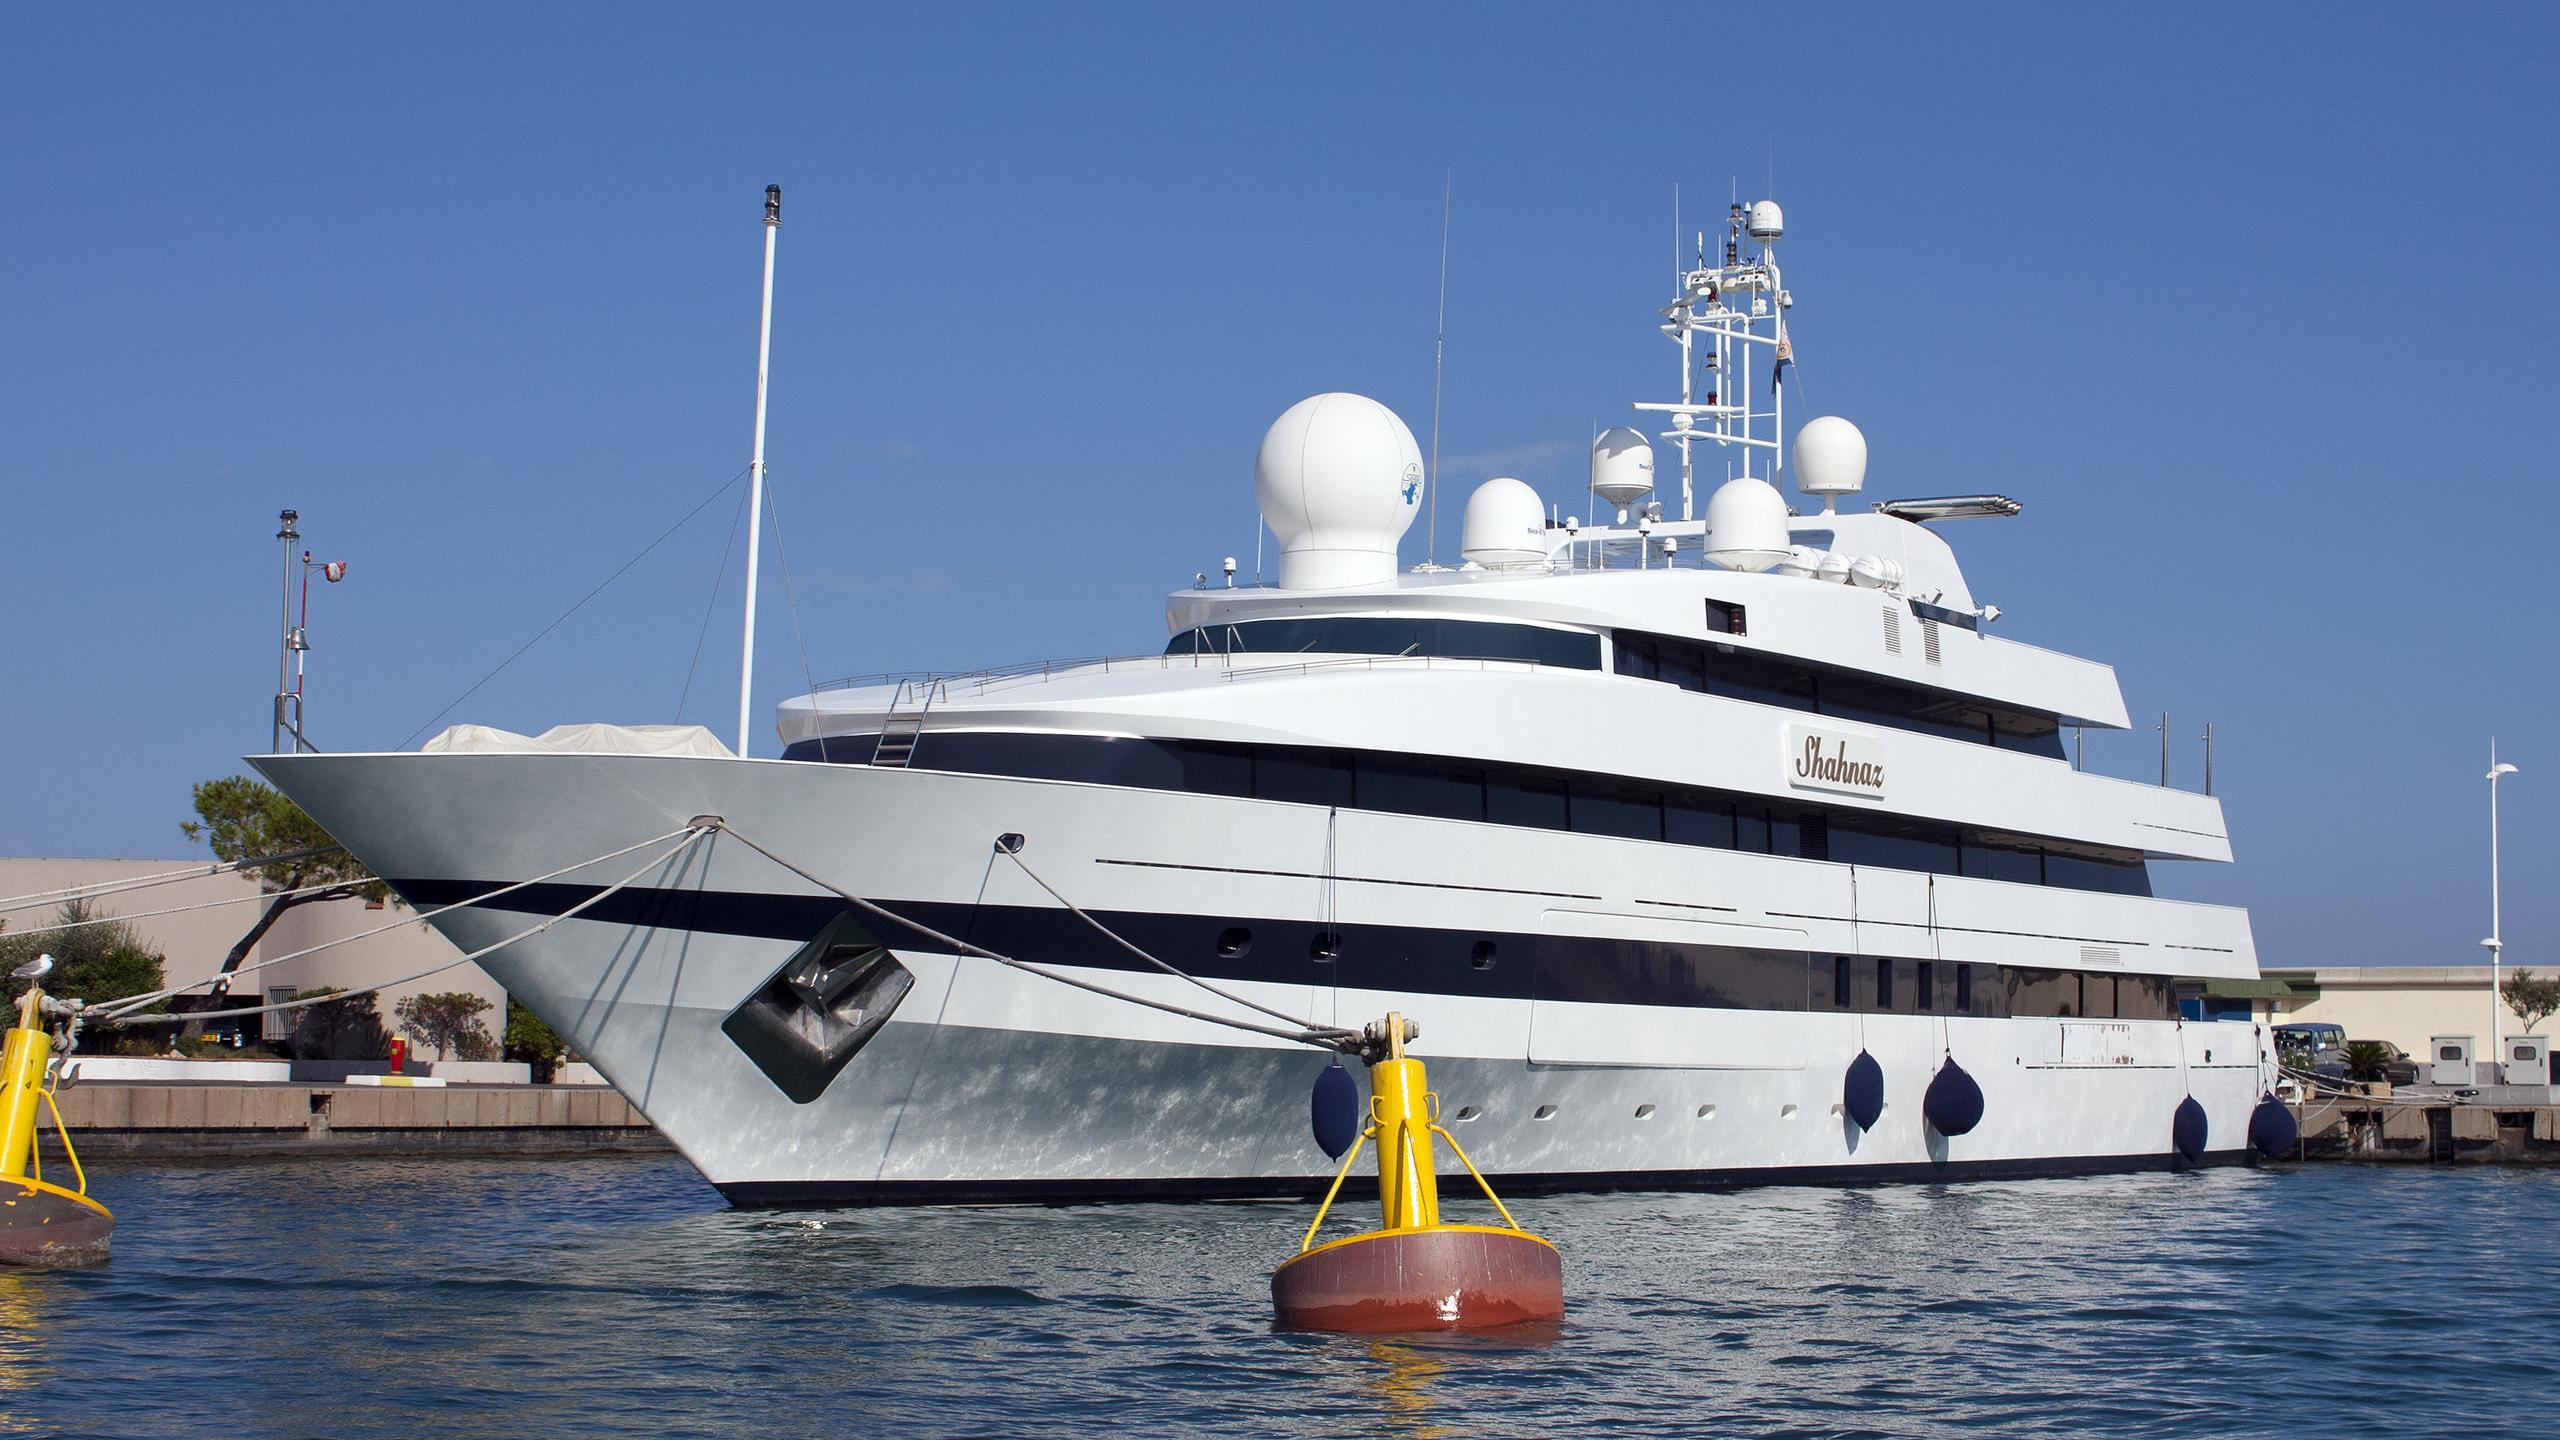 shahnaz-motor-yacht-nuovi-ligori-1991-63m-half-profile